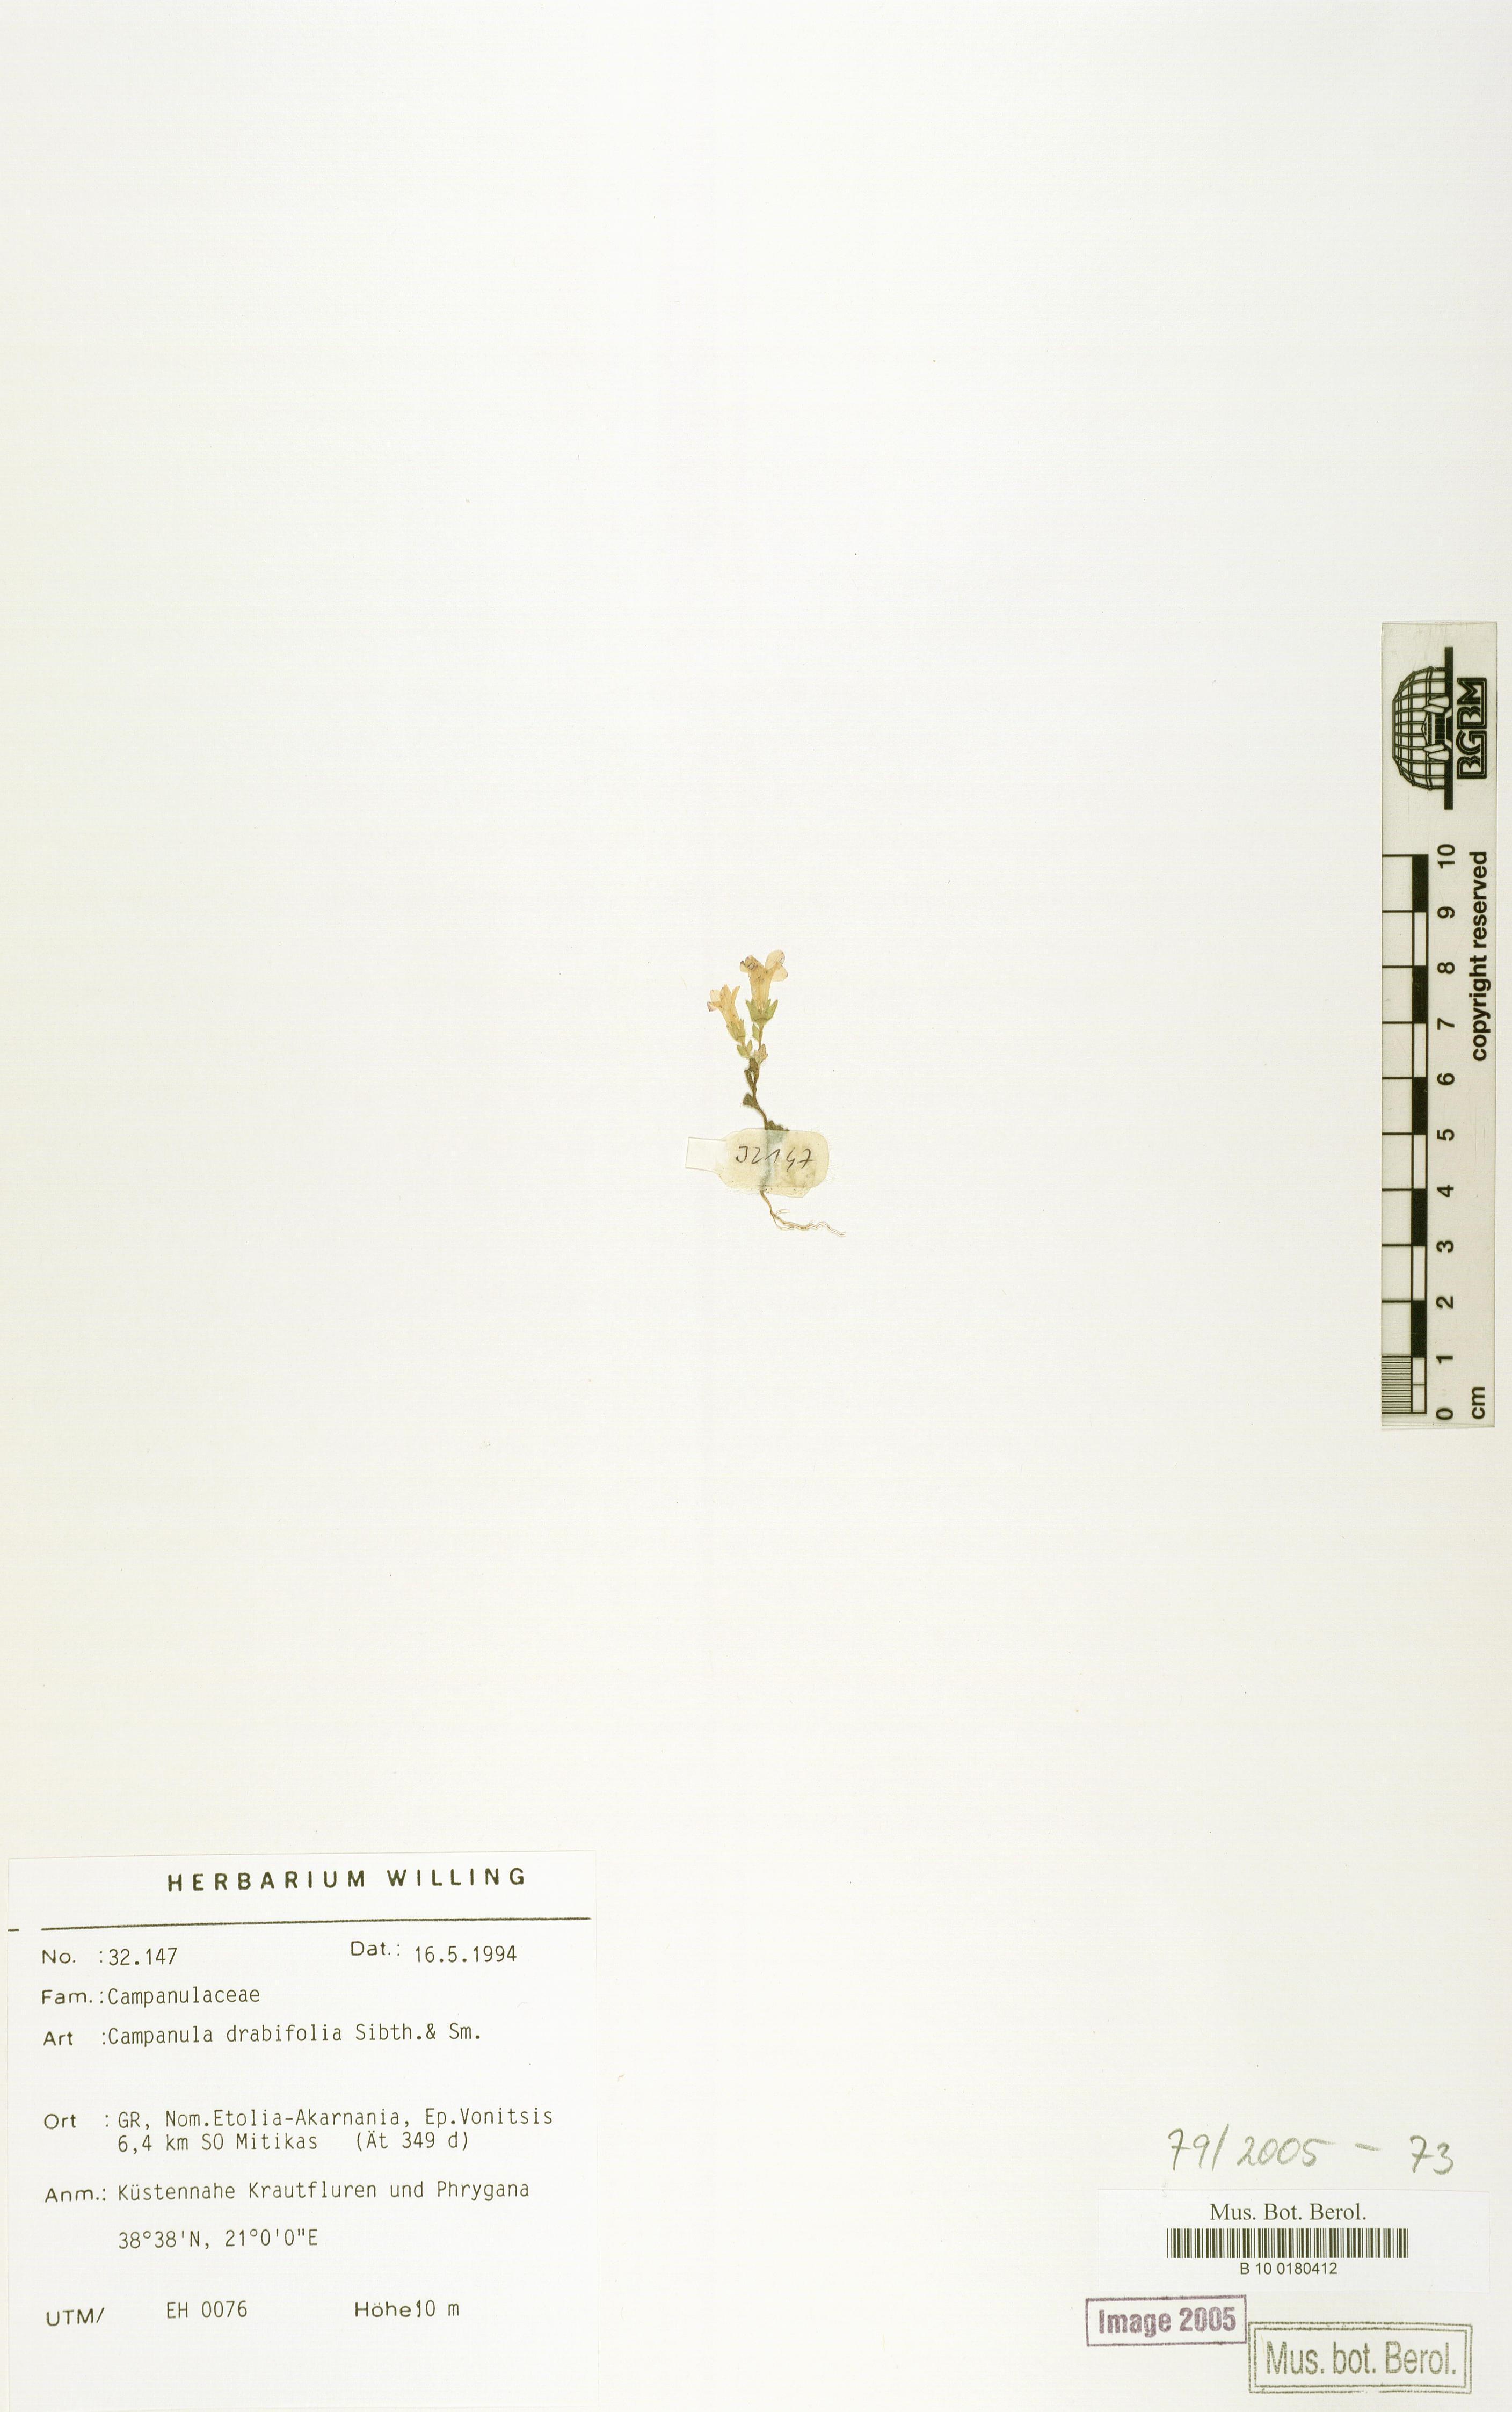 http://ww2.bgbm.org/herbarium/images/B/10/01/80/41/B_10_0180412.jpg